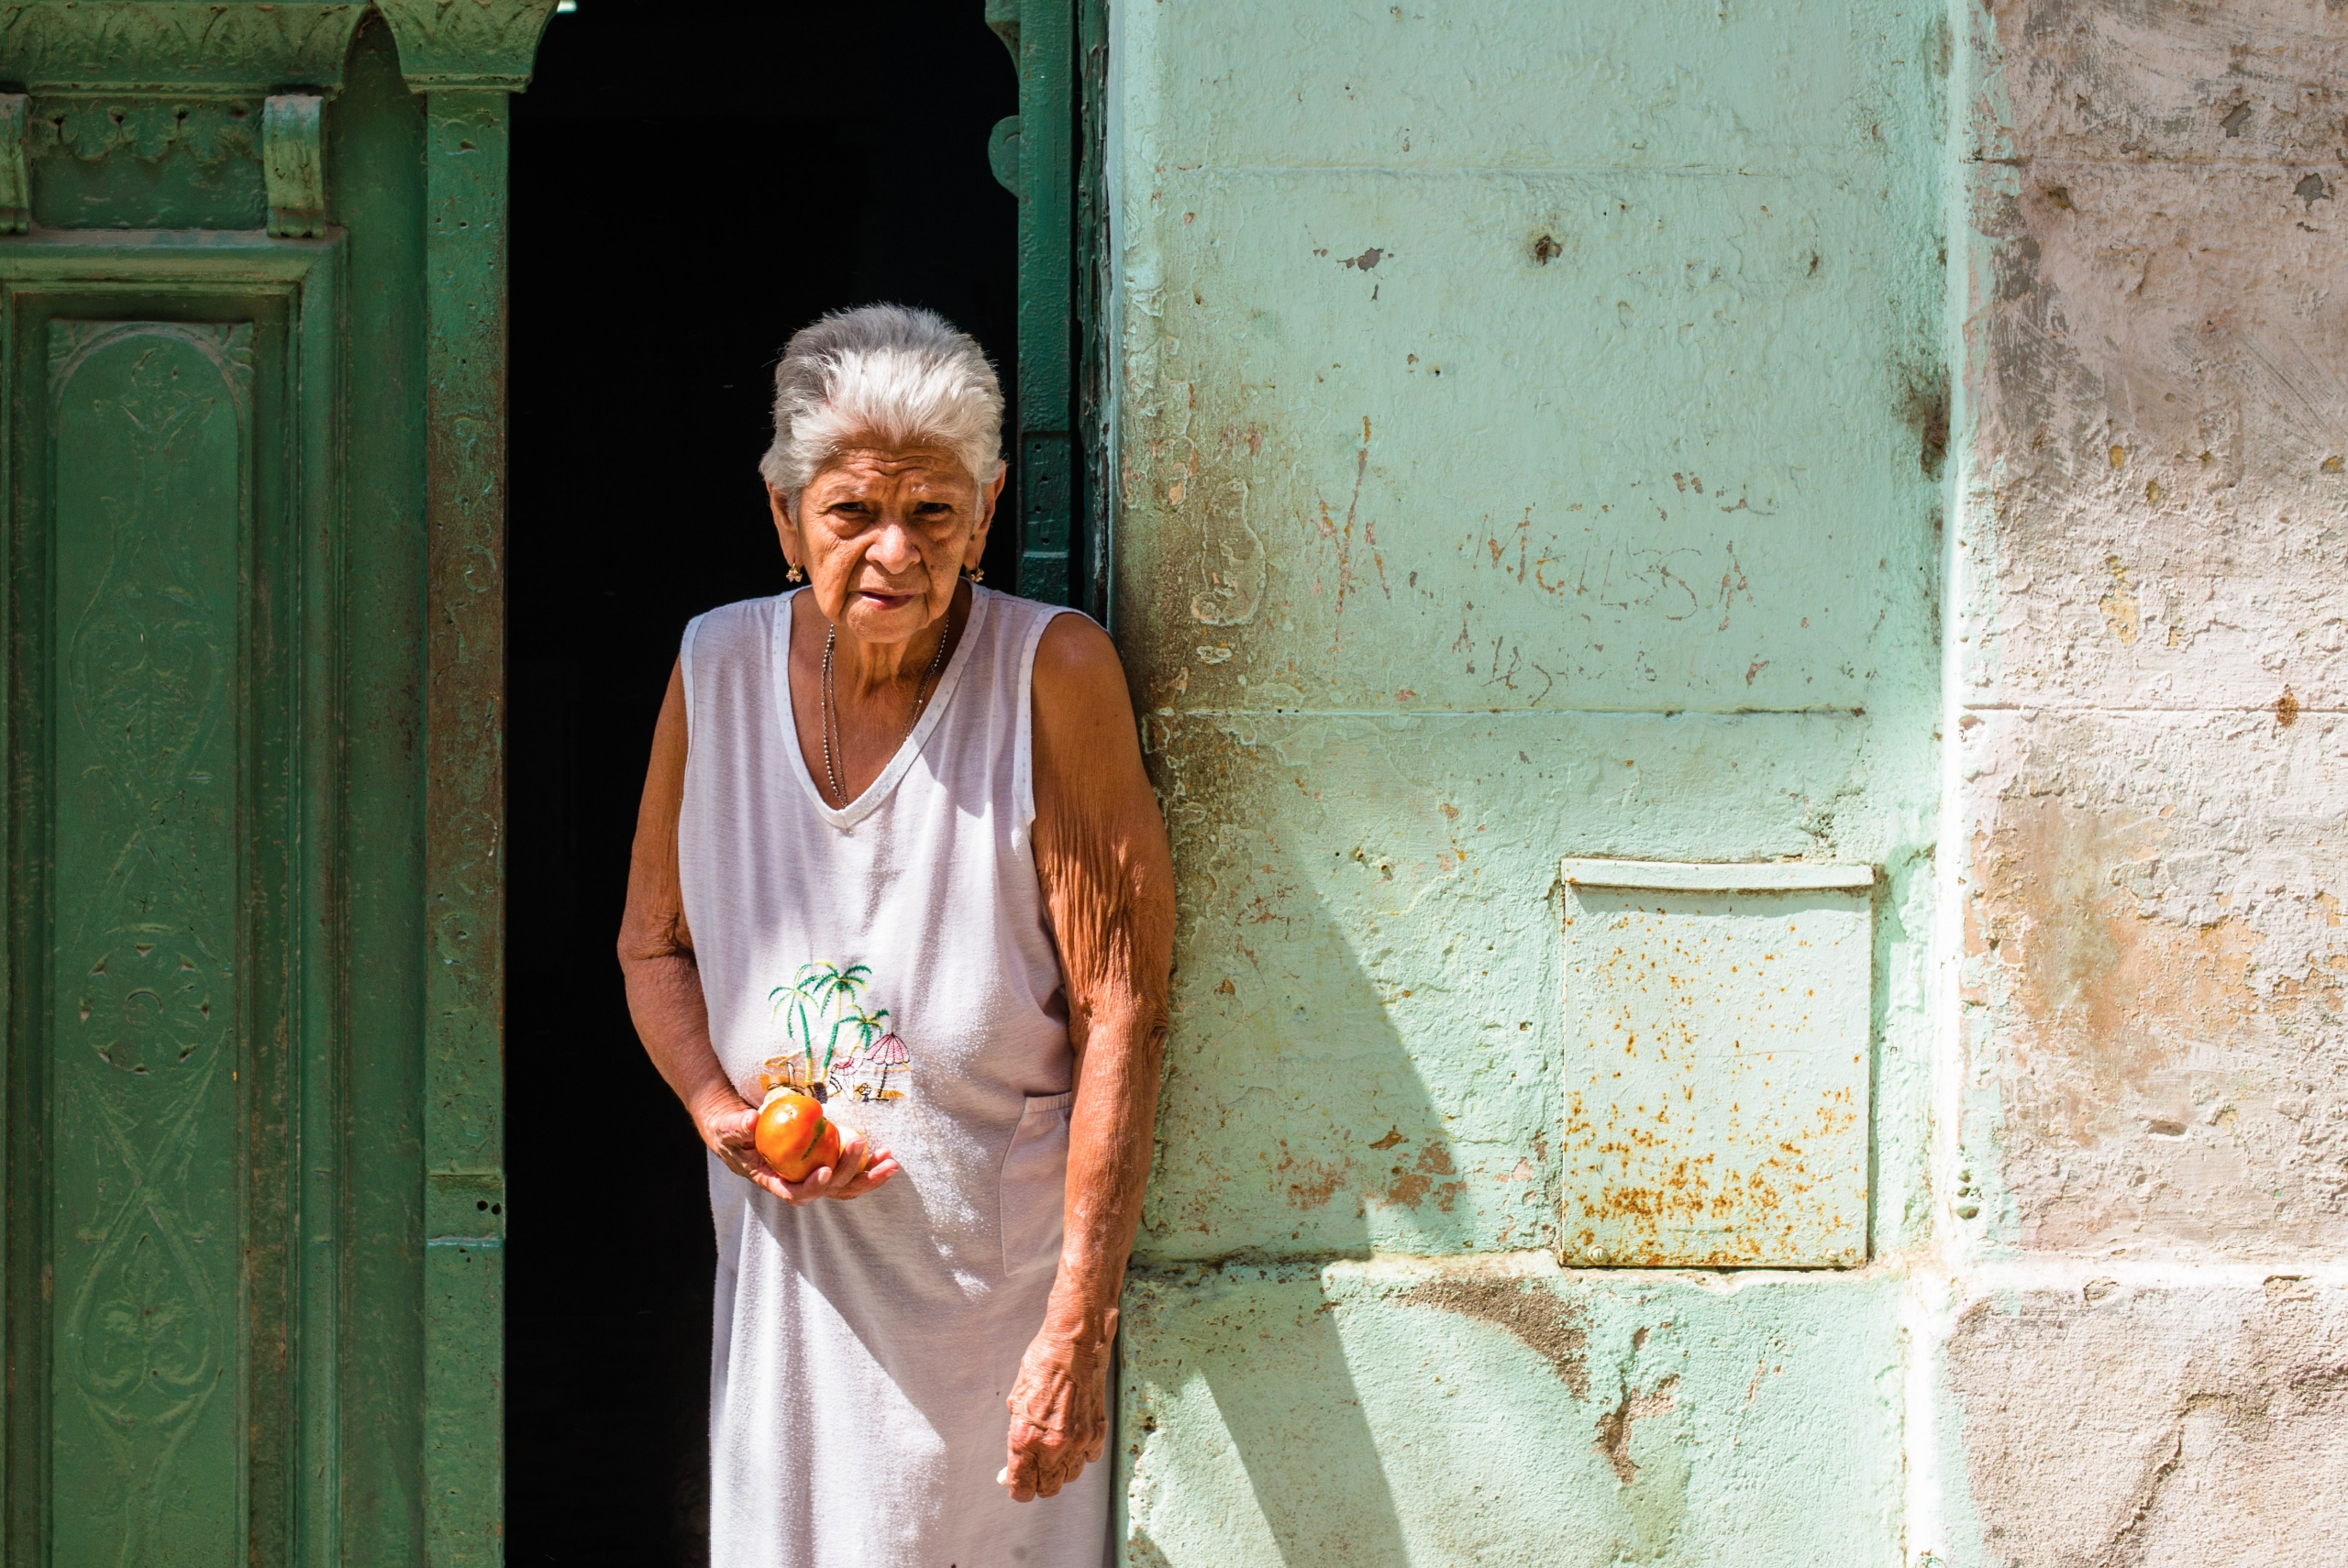 Tomato Time Havana, Cuba - giseleduprez | ello